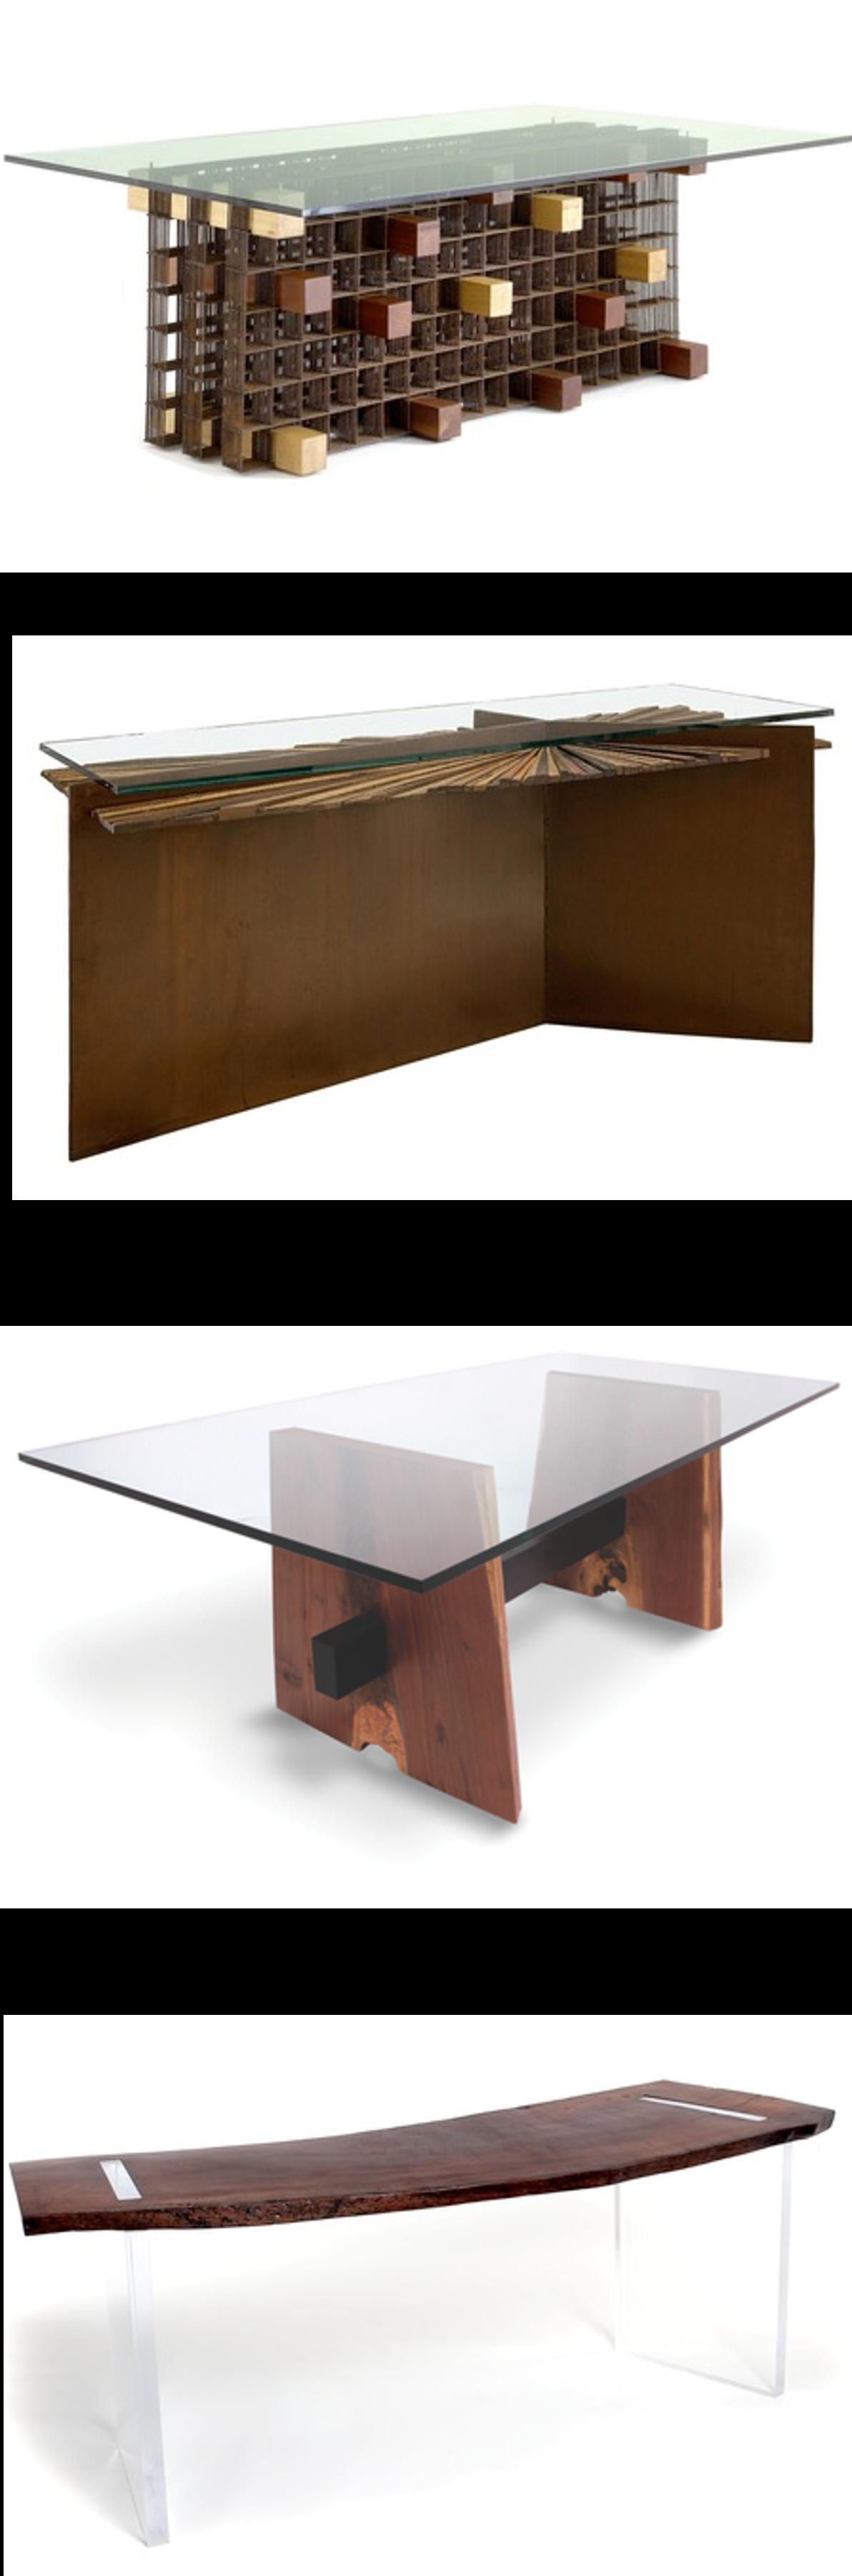 Floating desk woodworking plans plans diy how to make for Floating bench plans